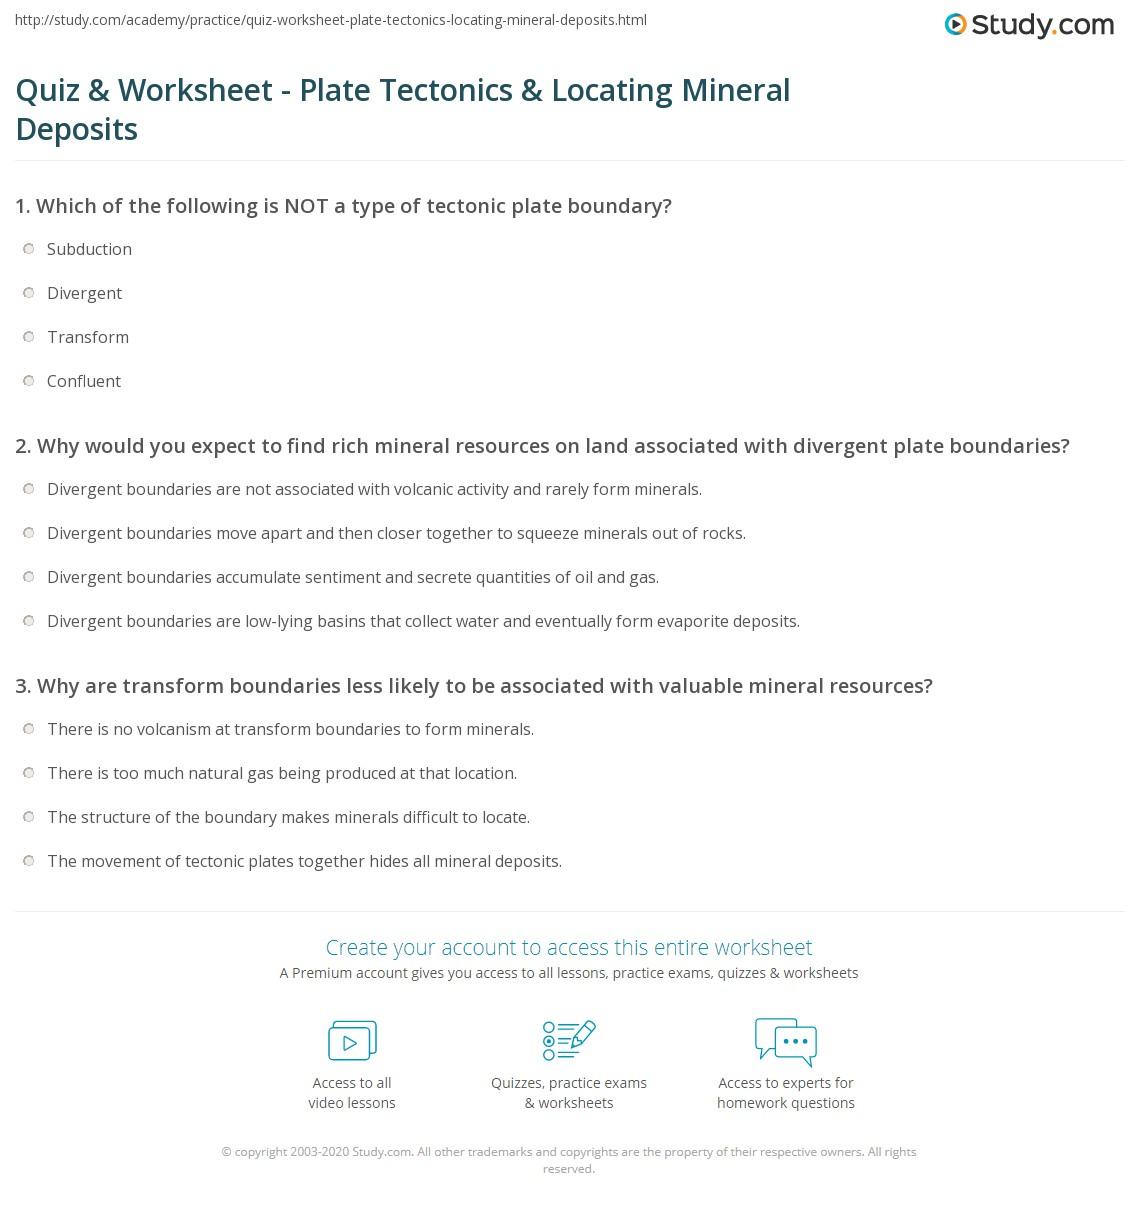 Worksheets Plate Tectonics Worksheets quiz worksheet plate tectonics locating mineral deposits print and the location of worksheet